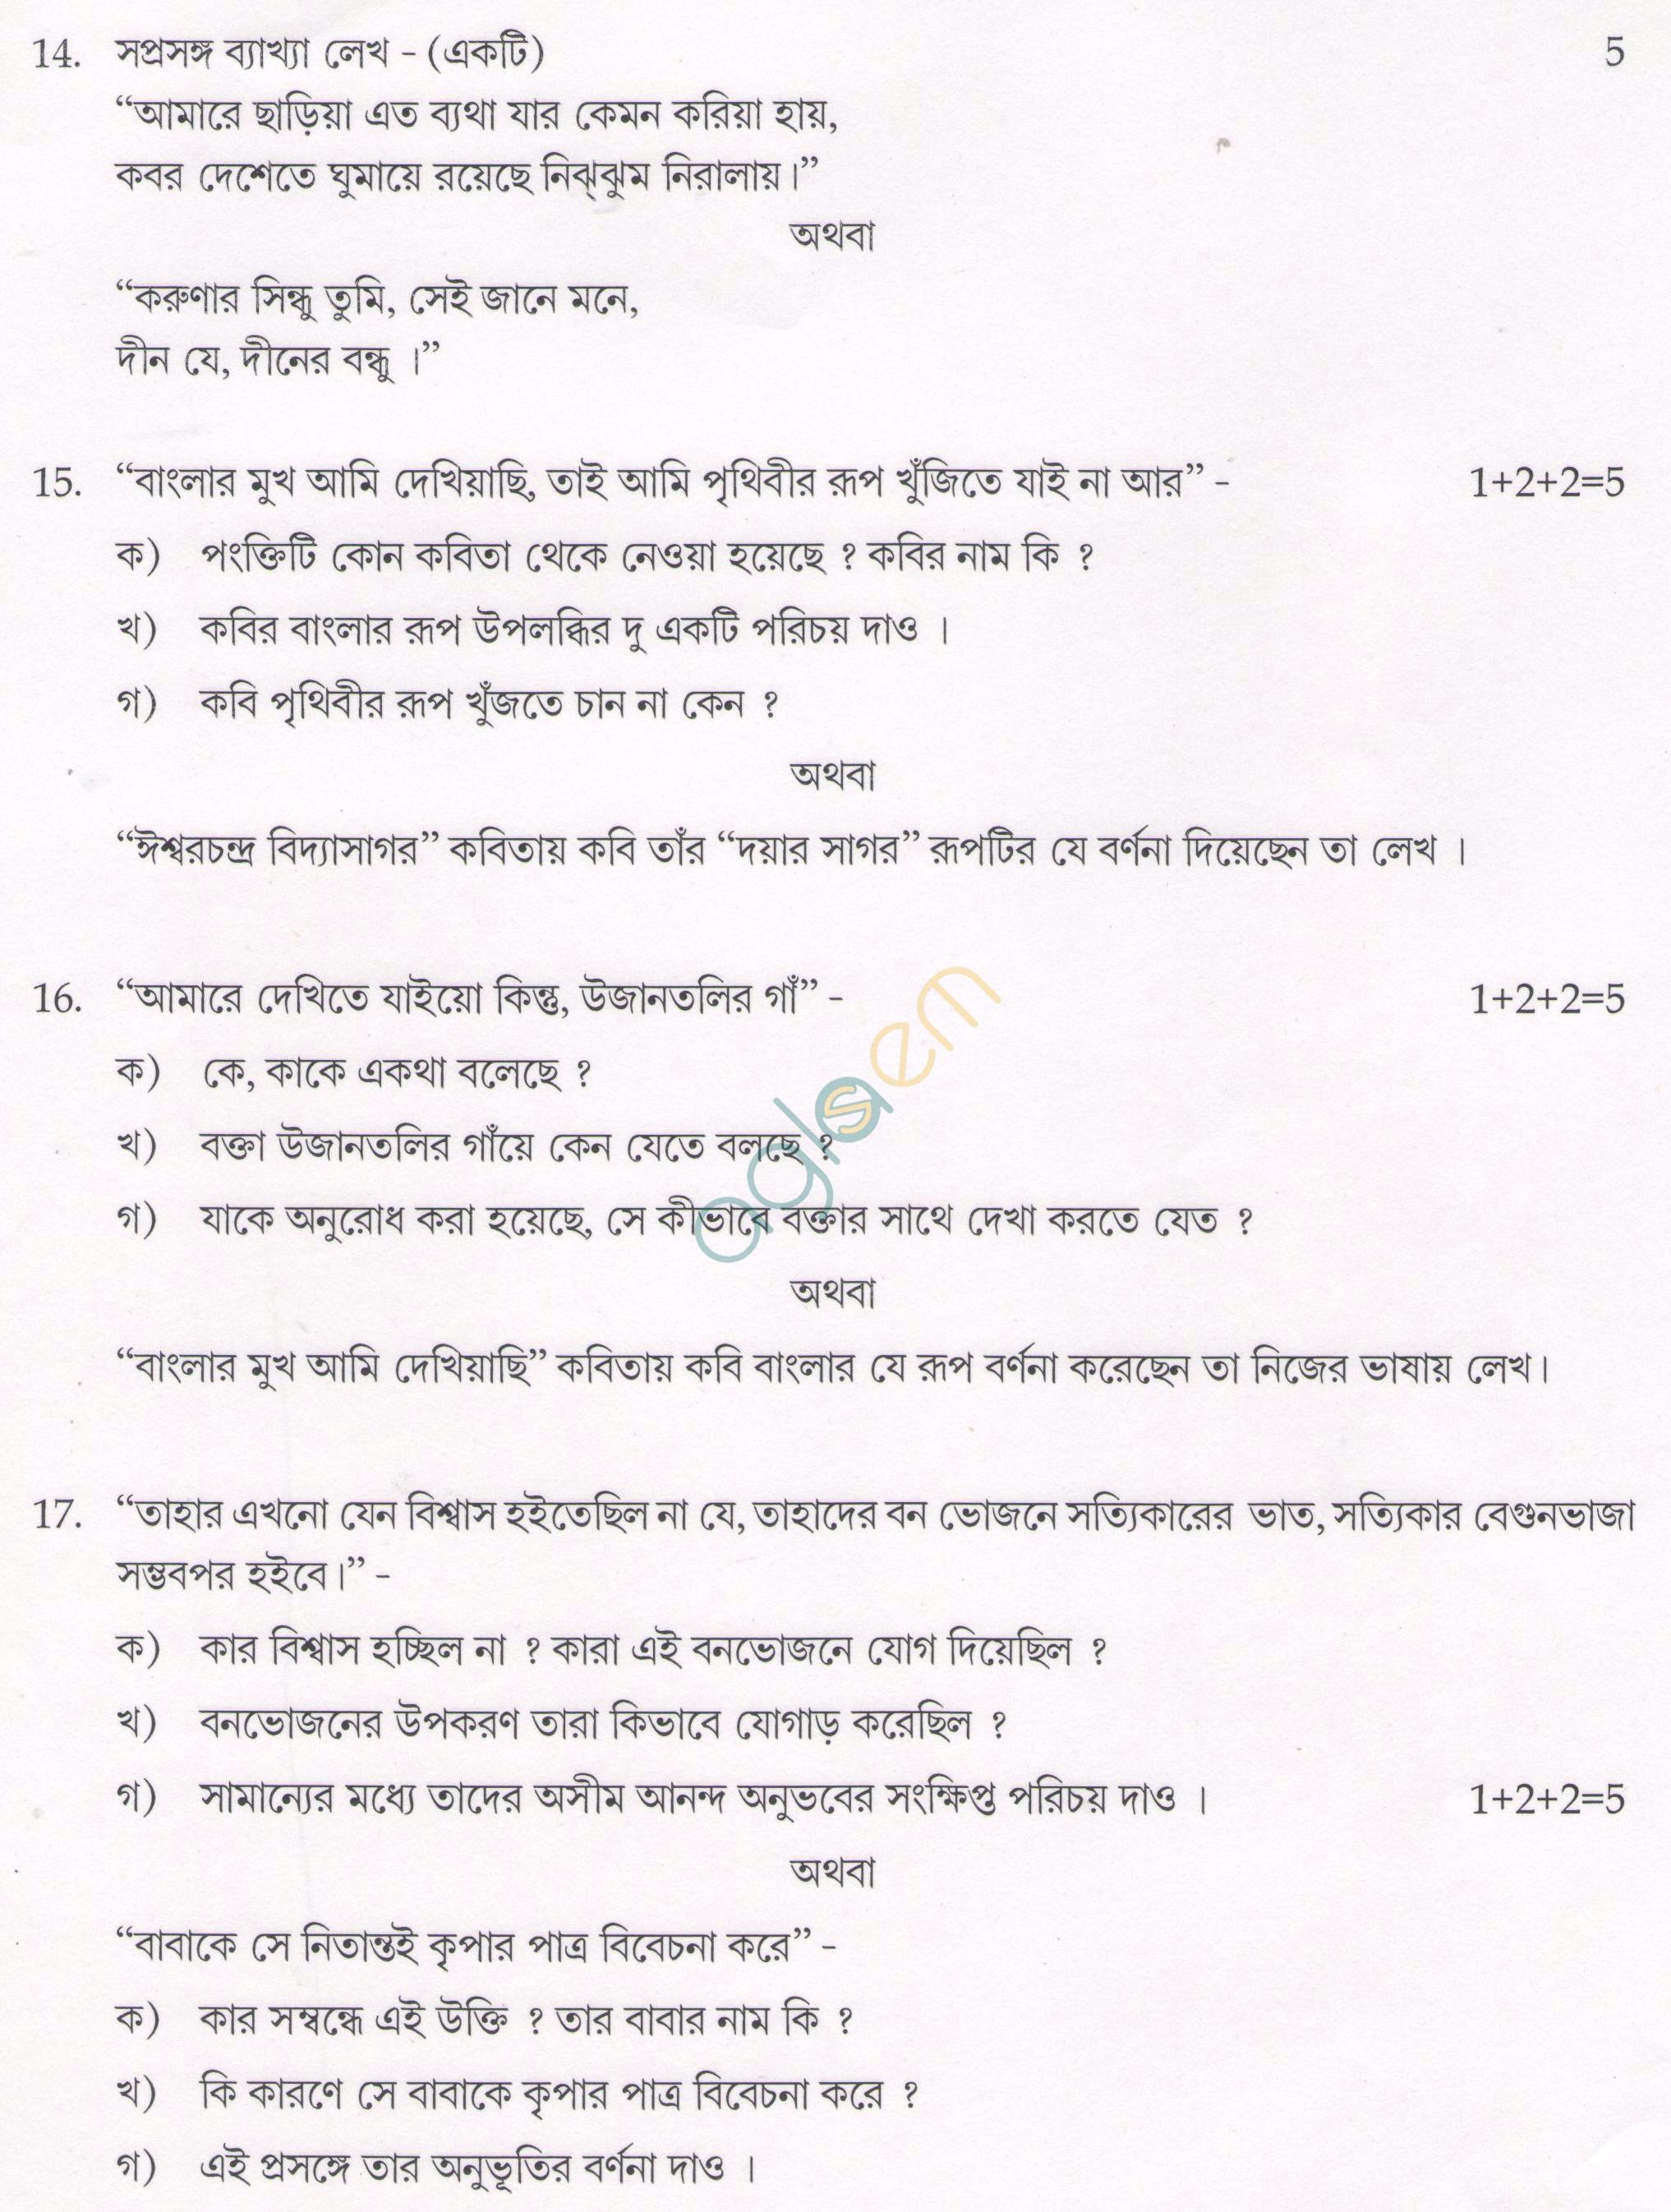 Verification Worksheet Umkc